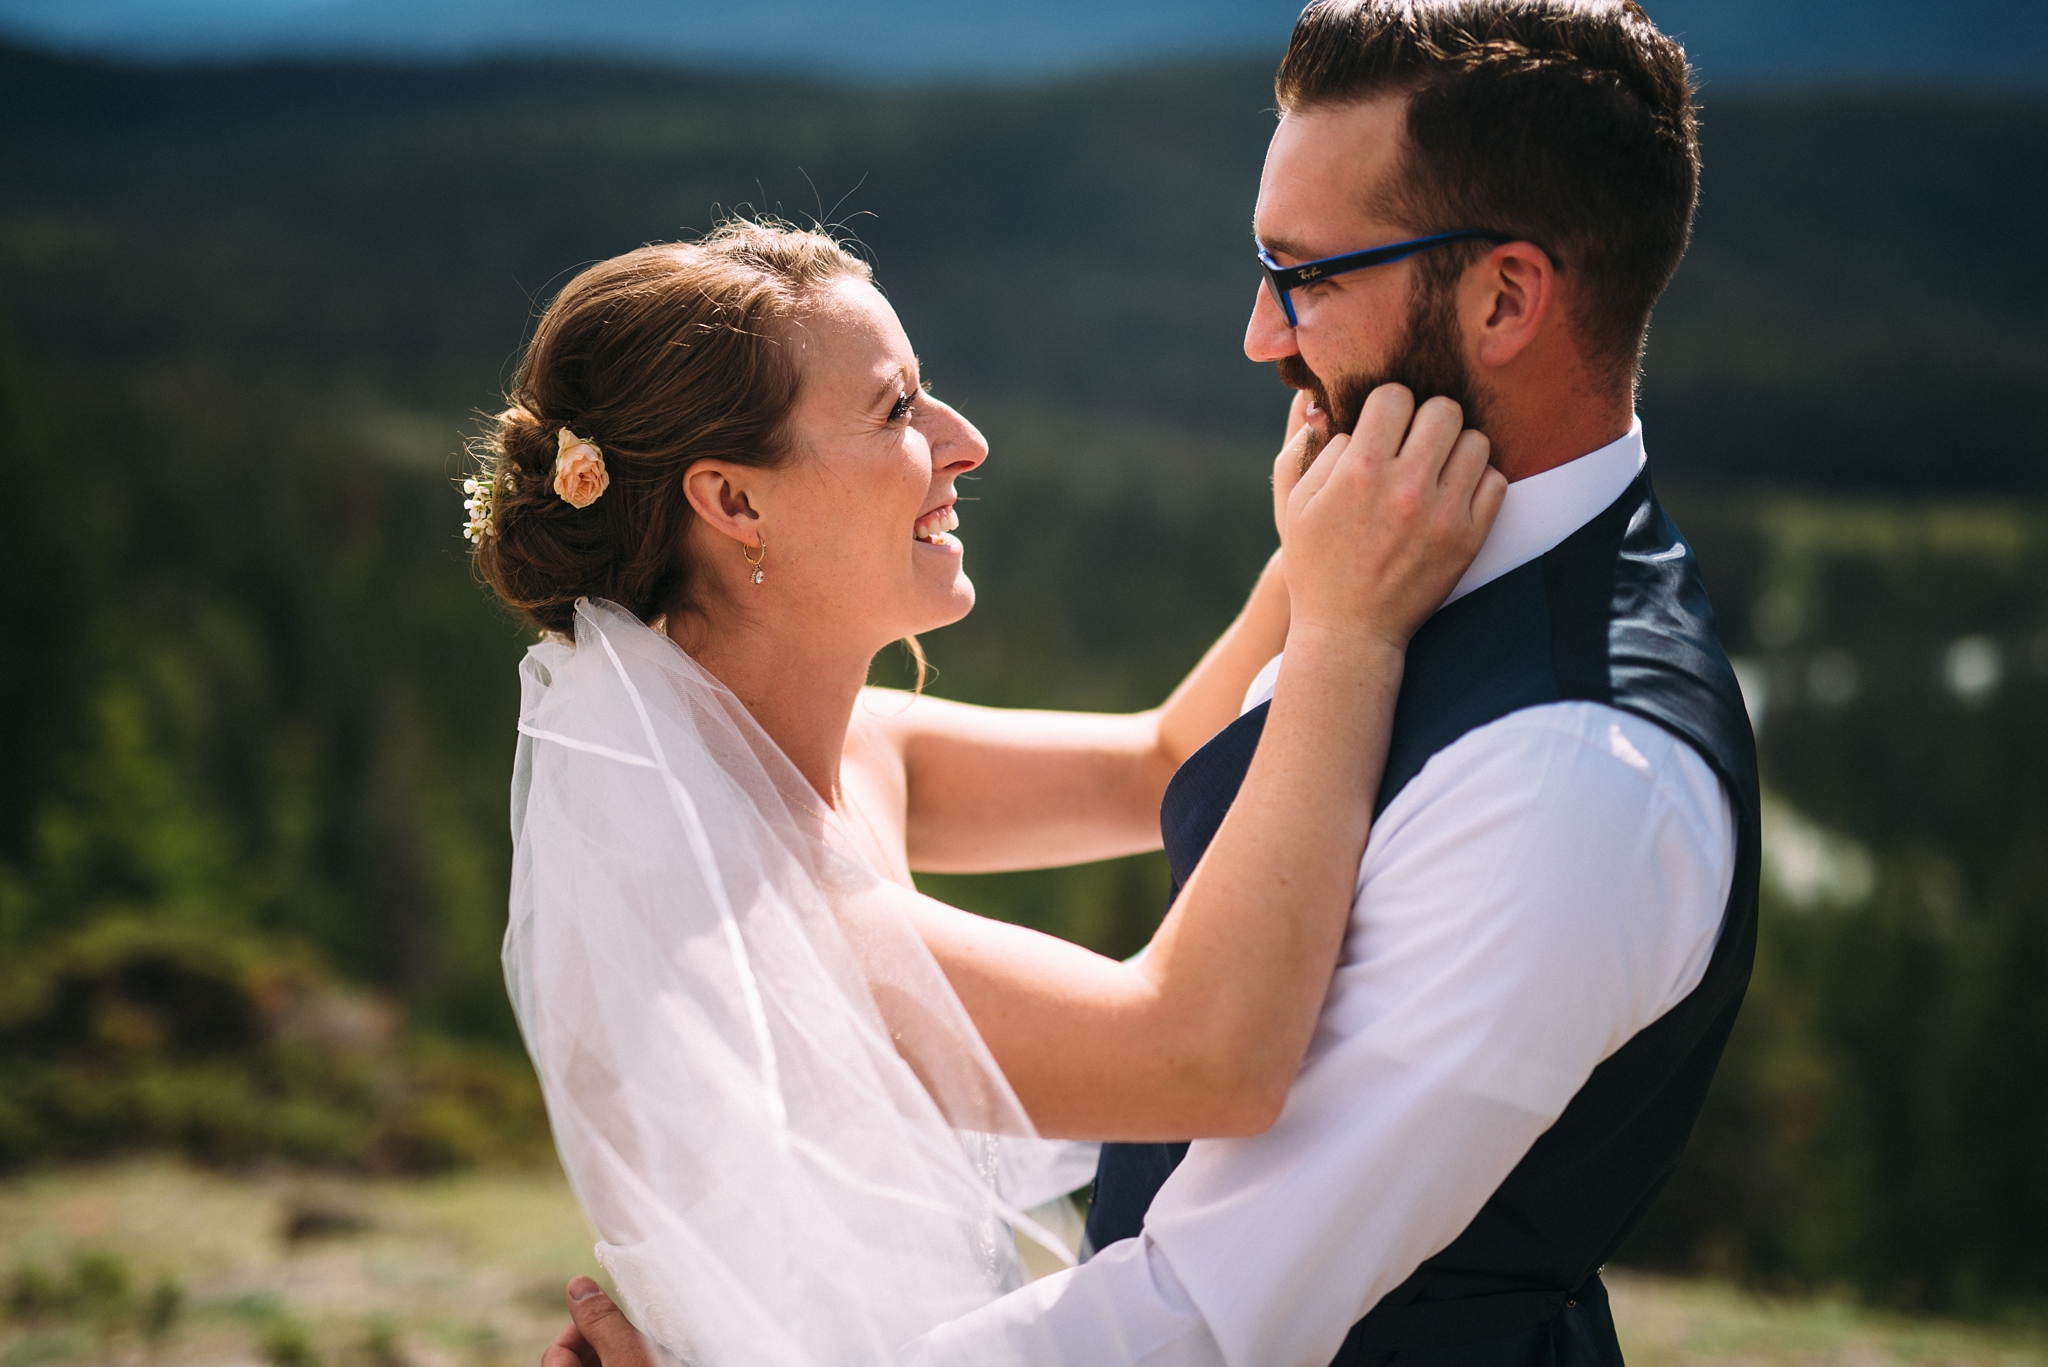 kaihla_tonai_intimate_wedding_elopement_photographer_2488